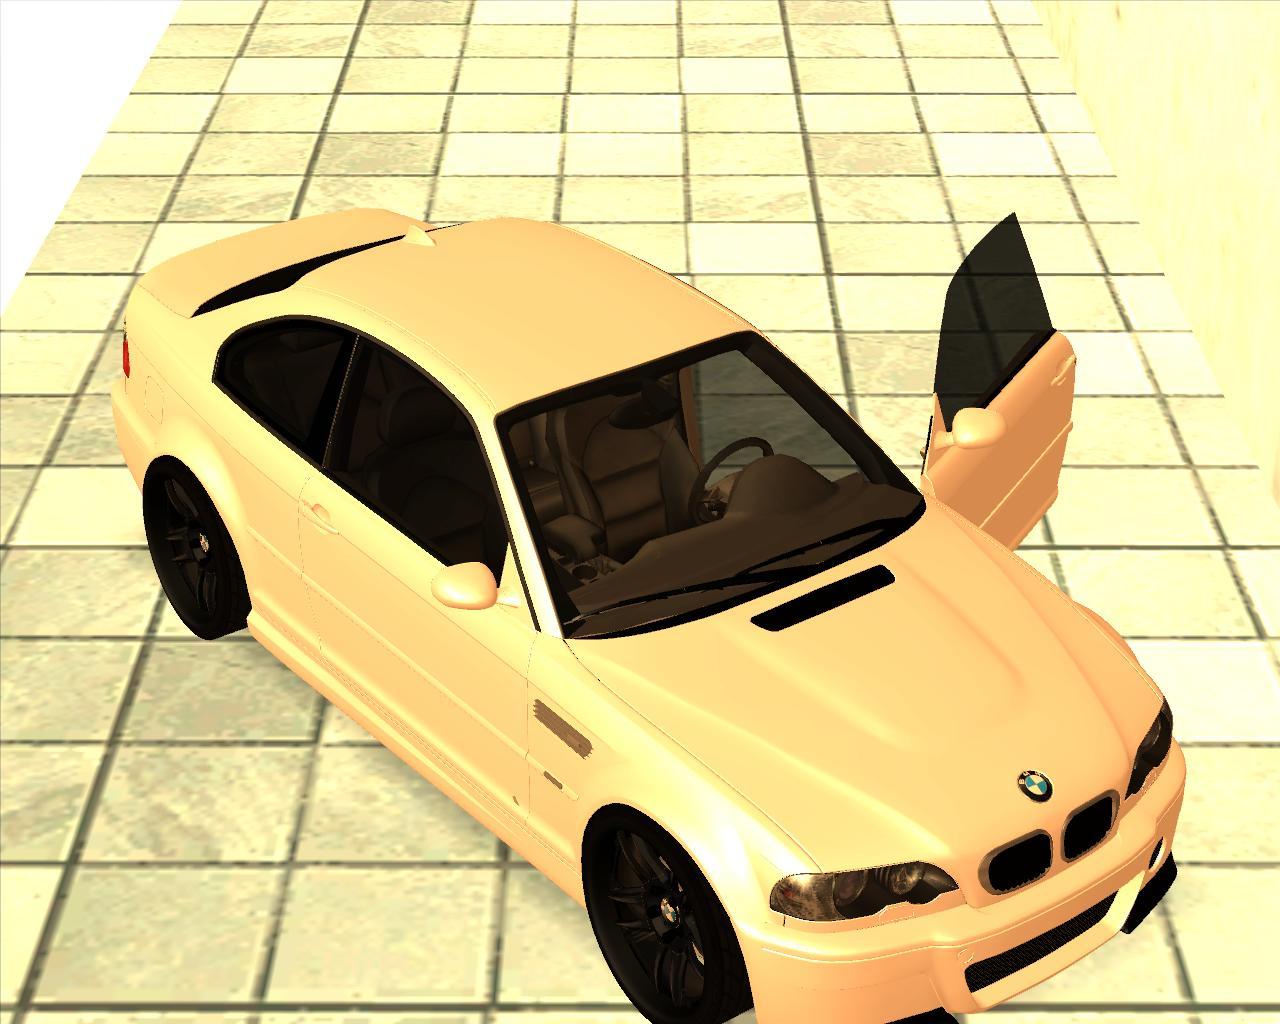 BMW E36 DRIFTING IN GTA SA -: NEW GTA SA MOD BMW E46 M3 CSL V0 1 by